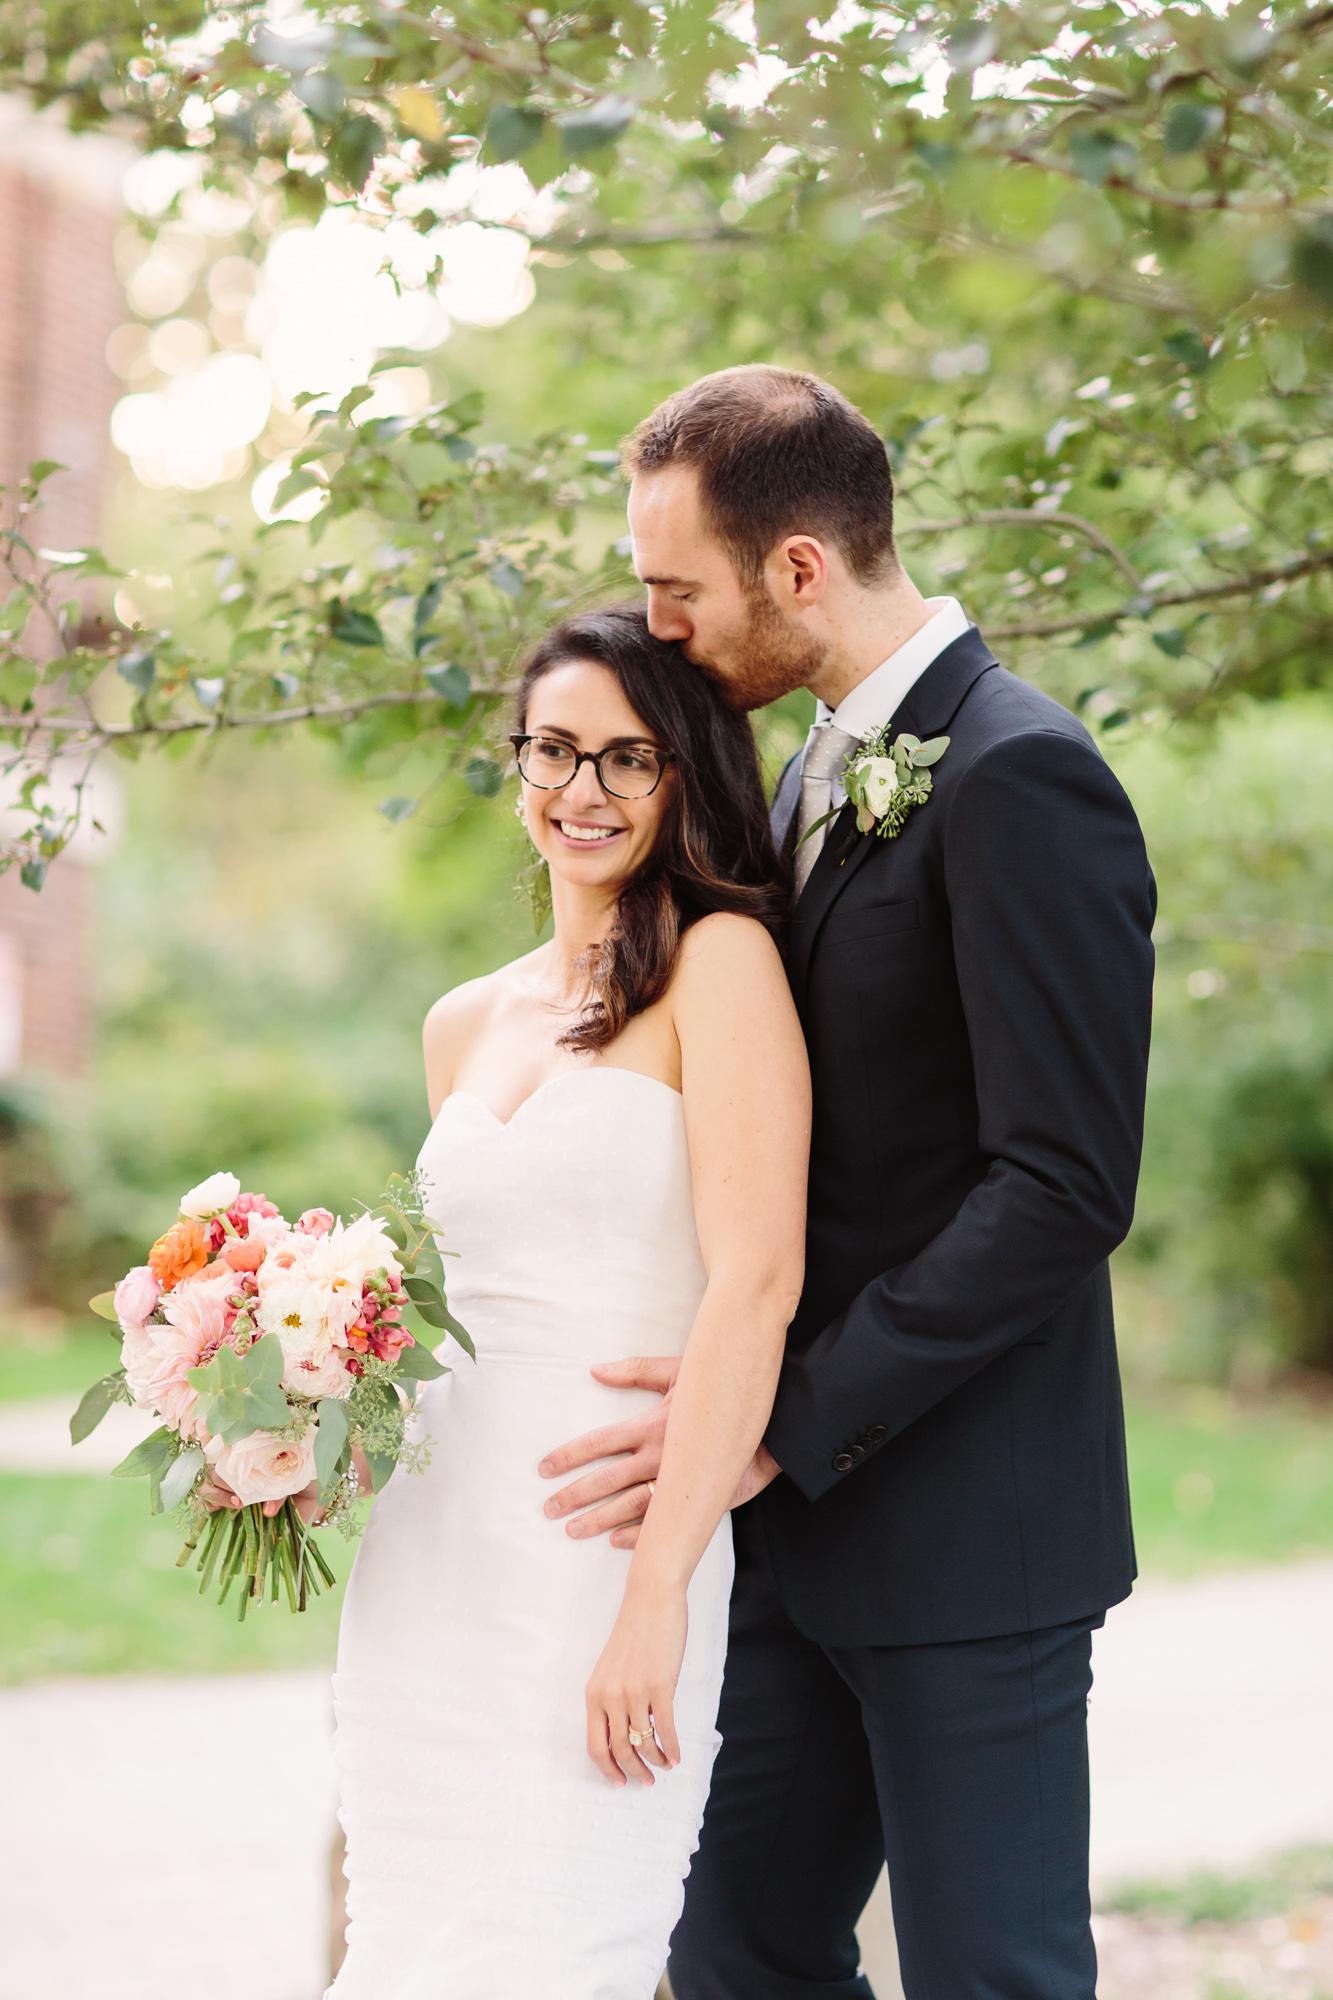 27_Kate_Sam_Picnic_House_Wedding_Brooklyn_NY_Tanya_Salazar_Photography_302.jpg